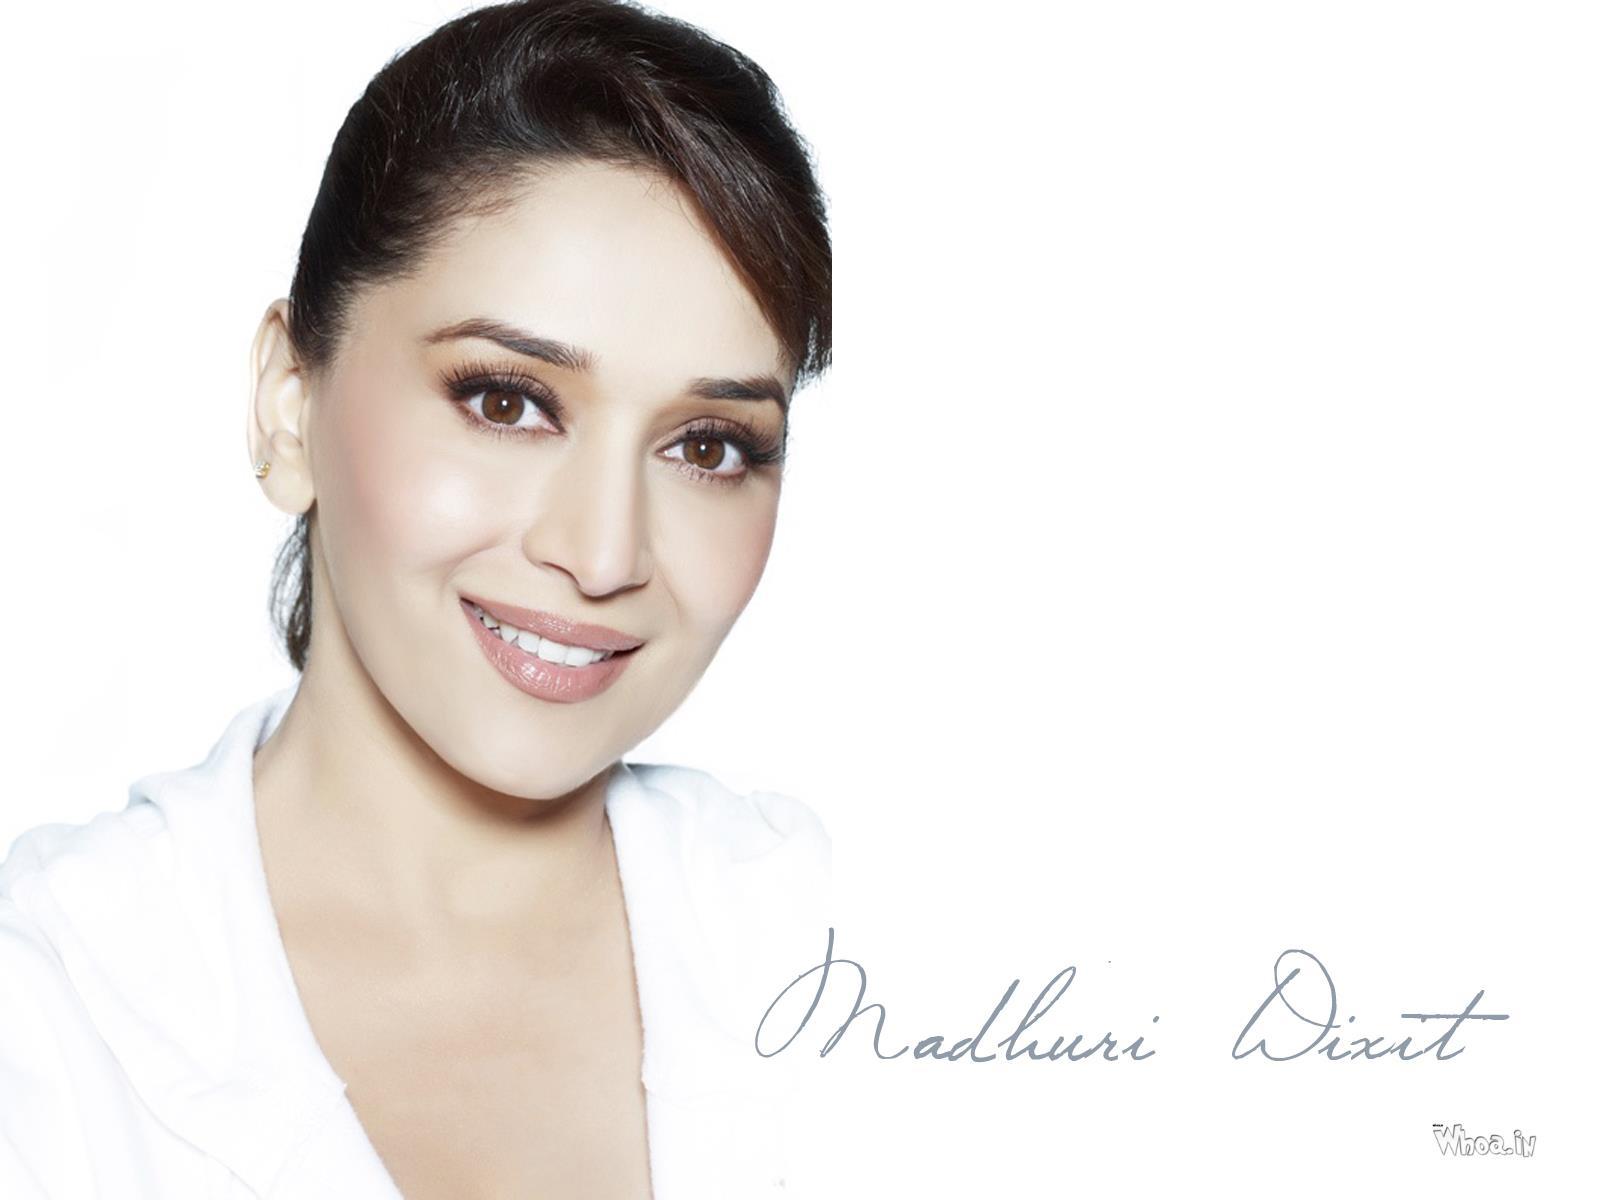 Madhuri Dixit White Dress Face Closeup HD Wallpaper